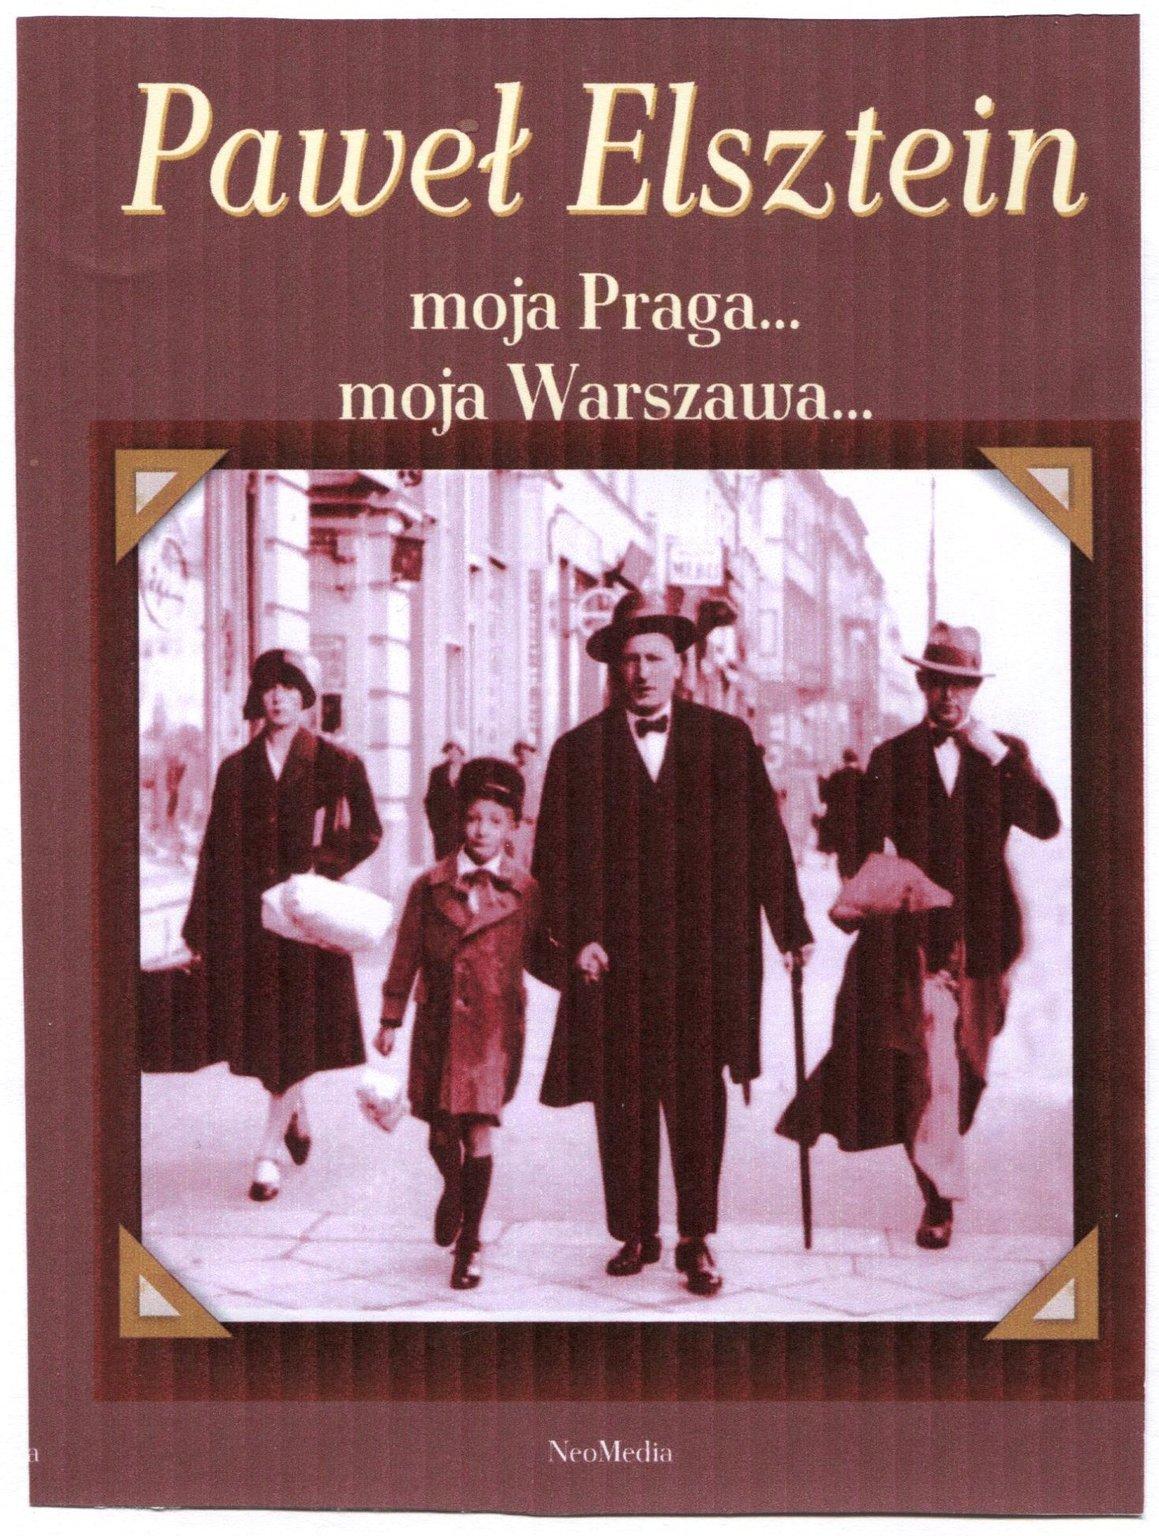 Paweł Elsztein - Moja Praga... Moja Warszawa...